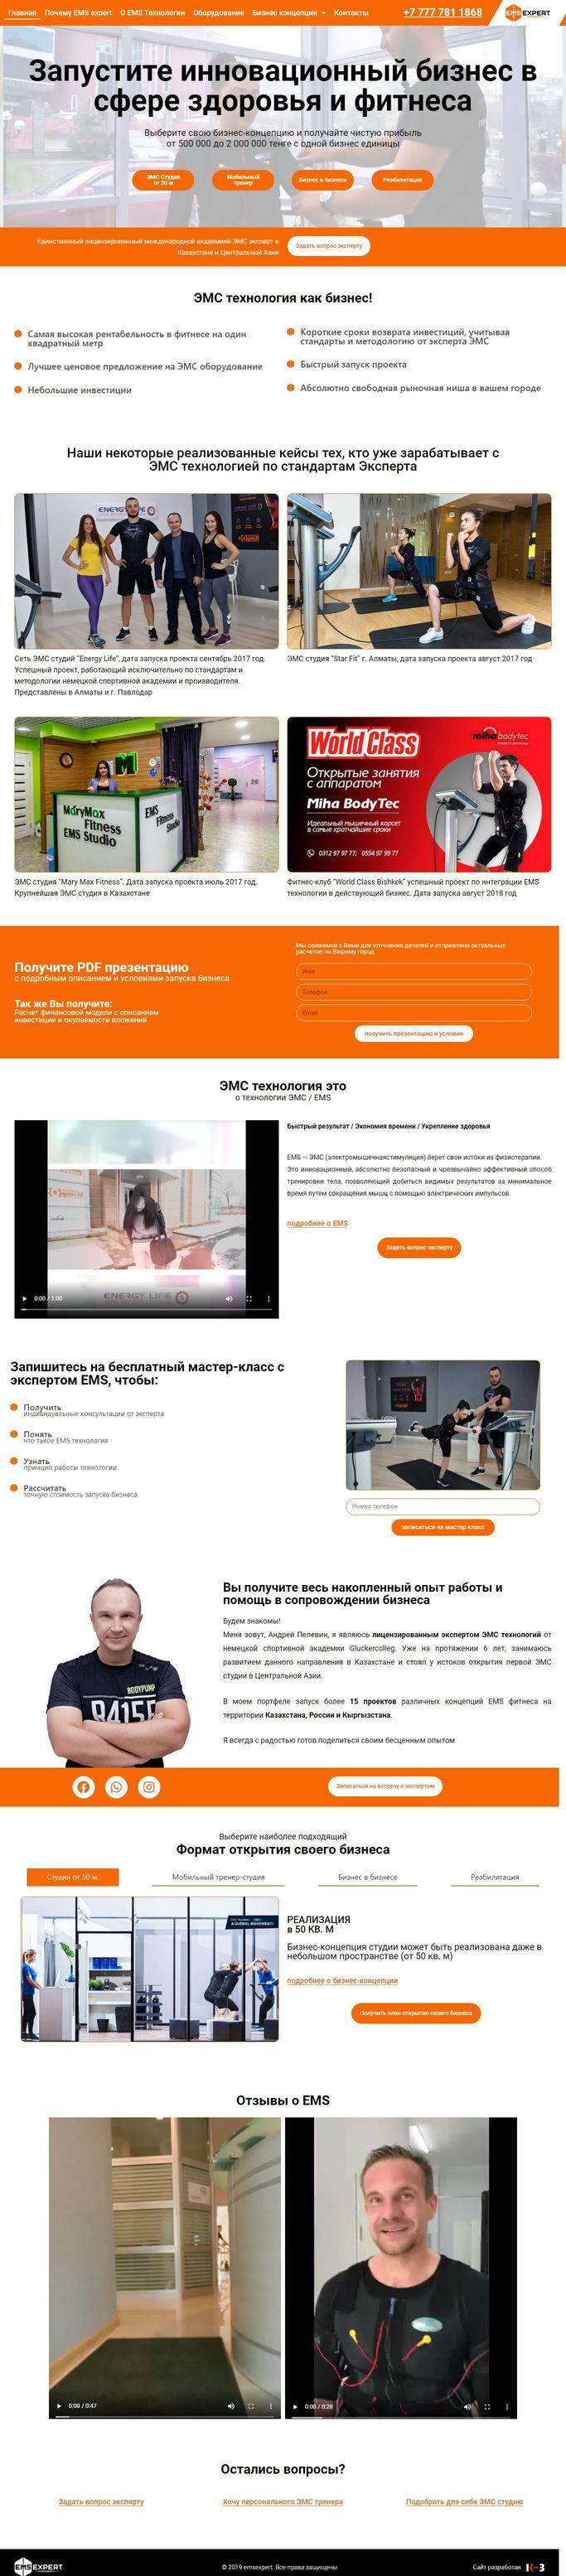 Корпоративный сайт по EMS технологии